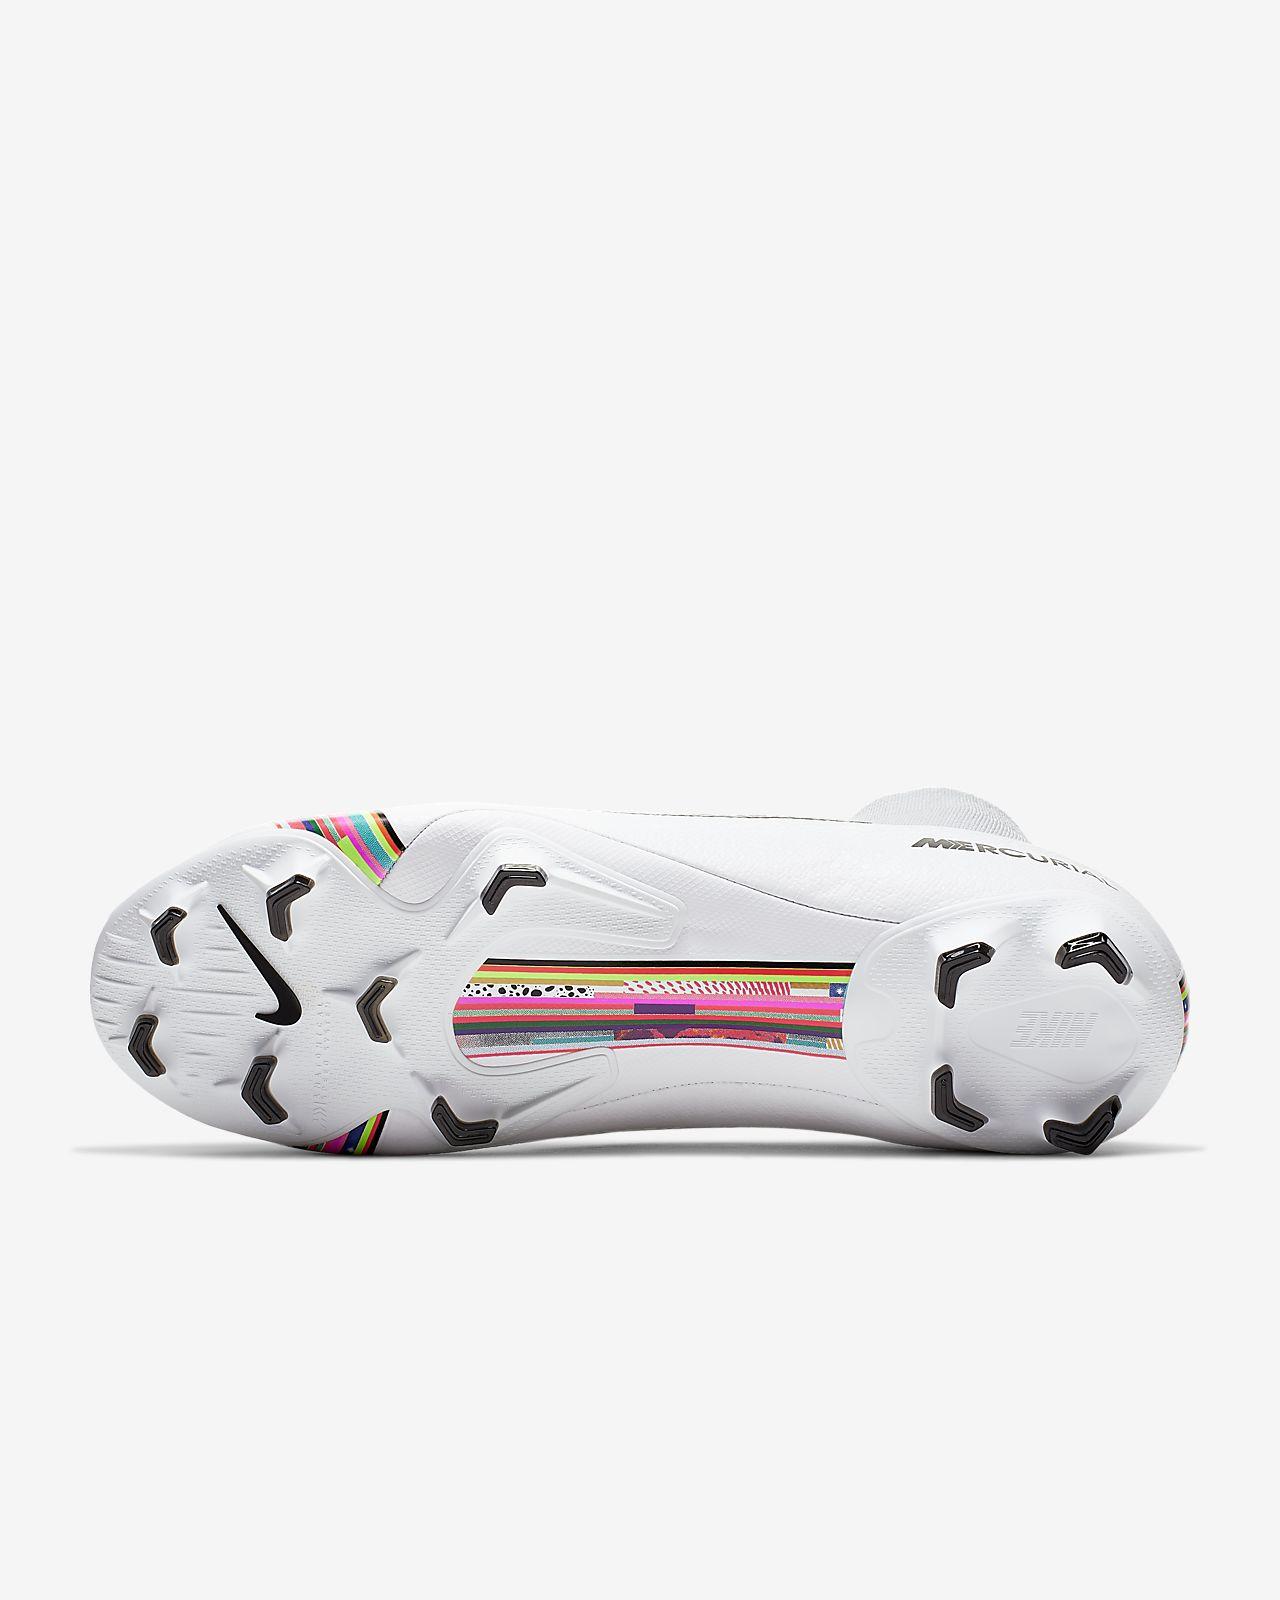 Nike Superfly 6 Pro LVL UP FG Botas de fútbol para terreno firme